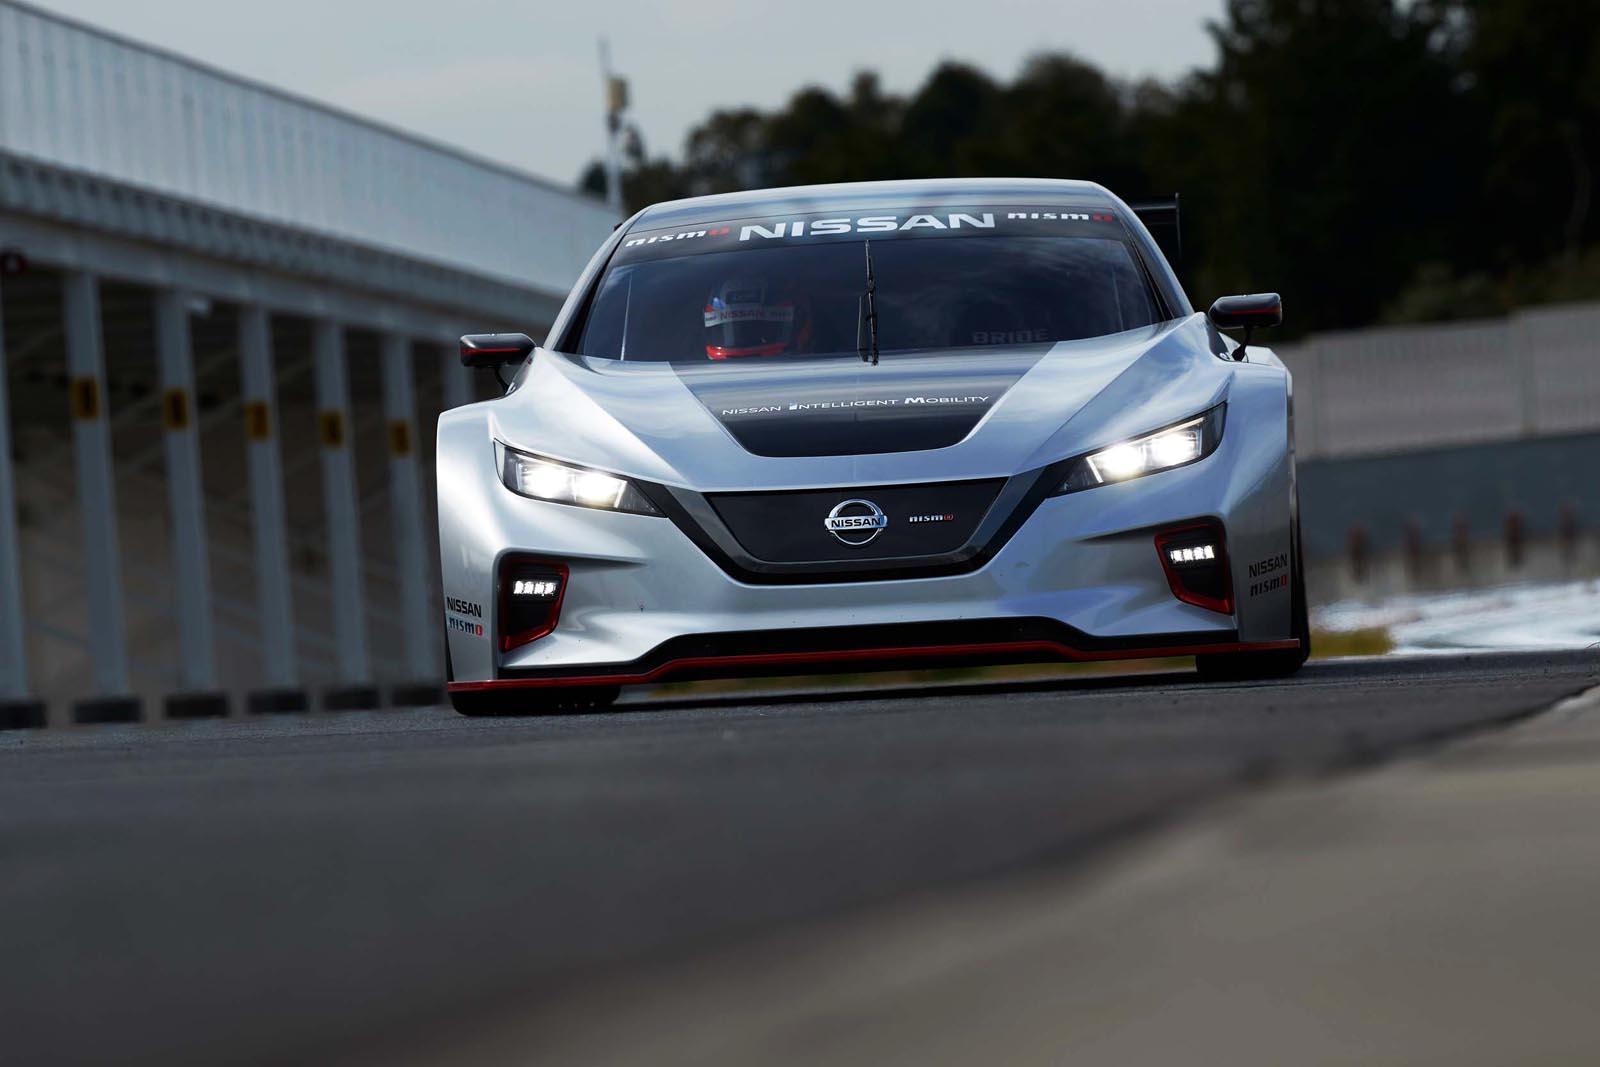 Photo of Η Nissan παρουσιάζει το αμιγώς ηλεκτροκίνητο αγωνιστικό LEAF NISMO RC